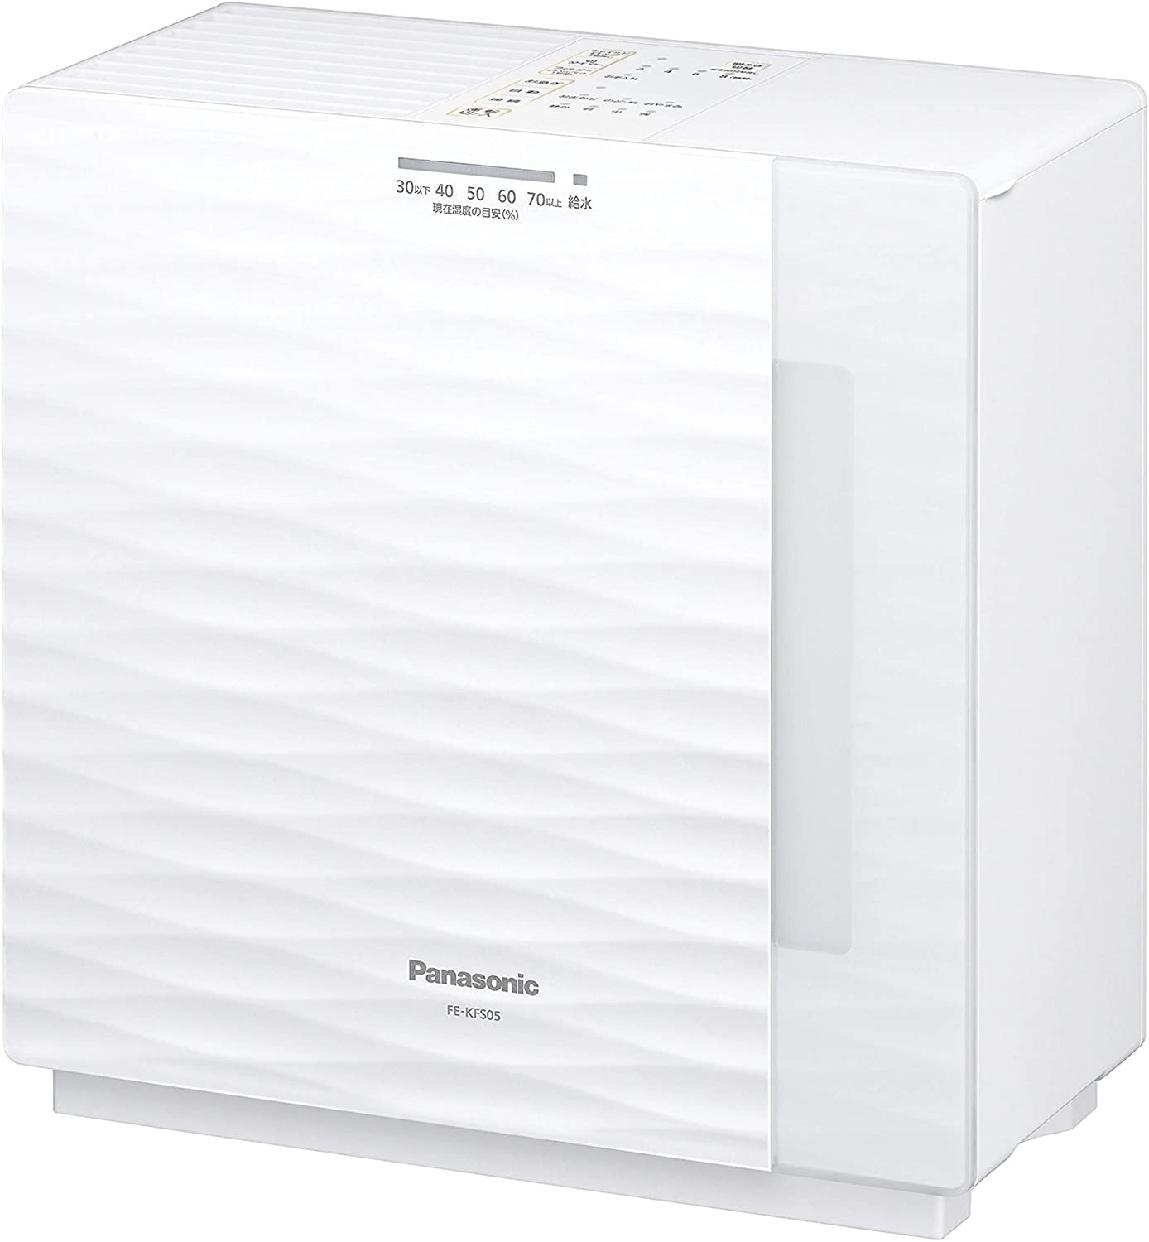 Panasonic(パナソニック) 加湿機 FE-KFS05の商品画像